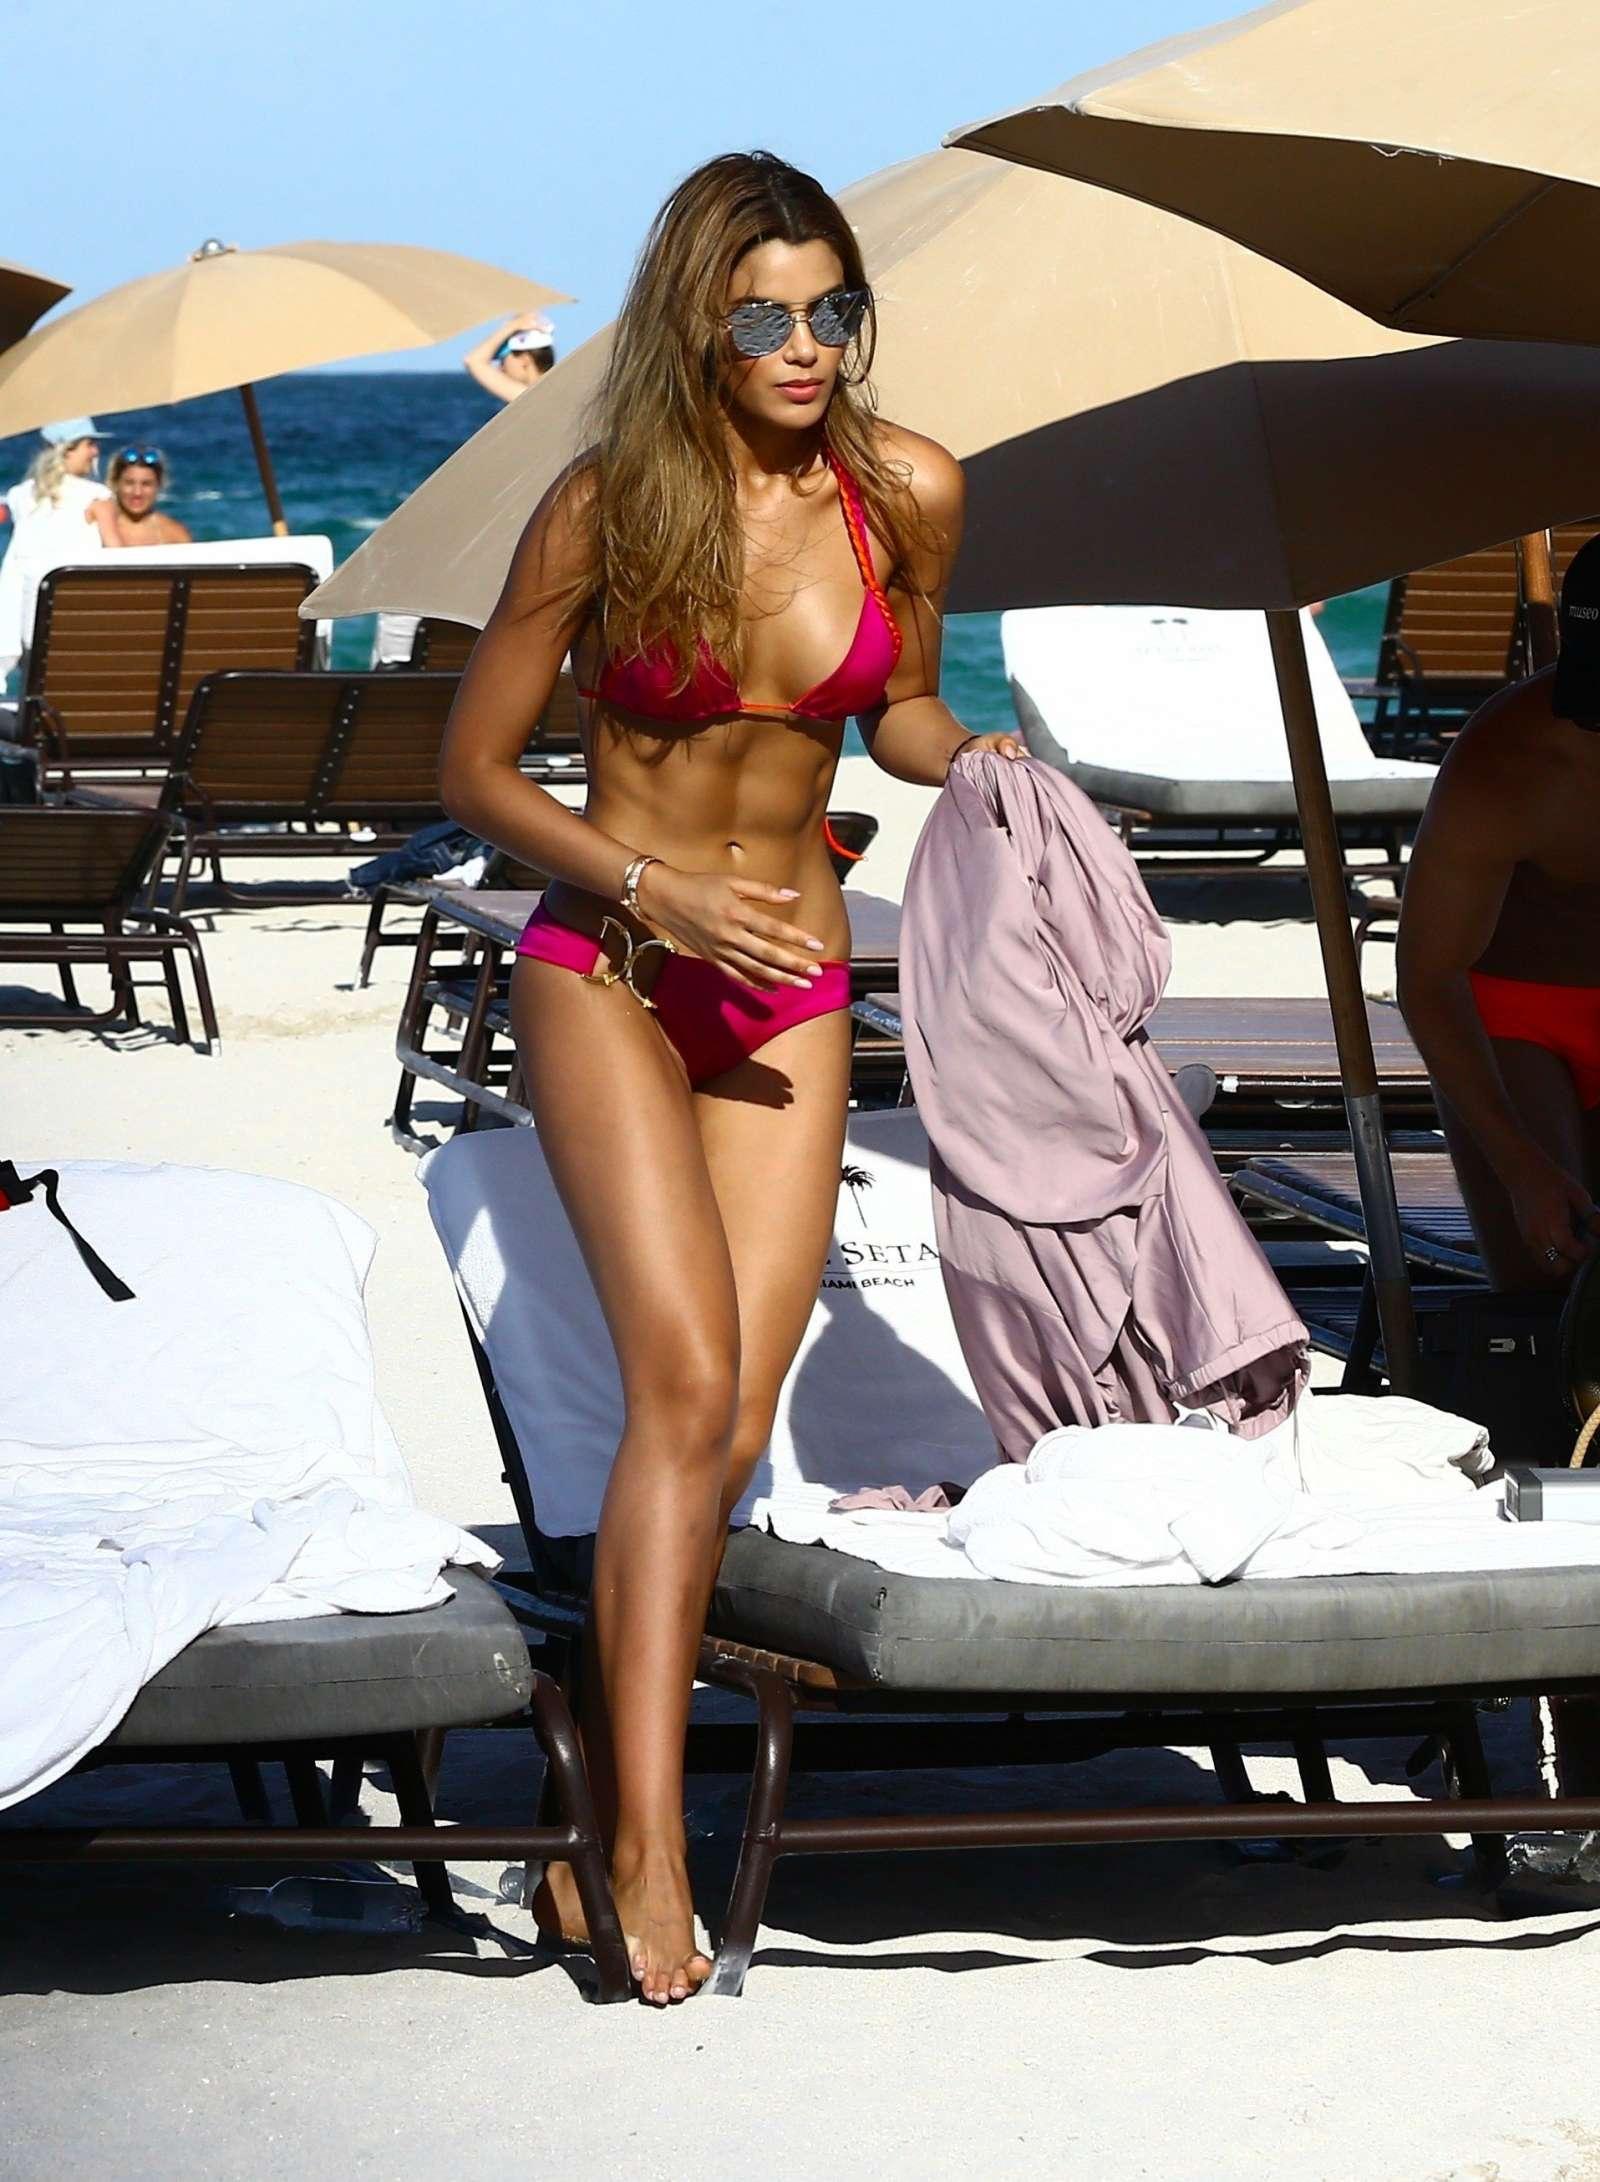 Bikini Ariadna Gutierrez nude (52 photo), Pussy, Hot, Twitter, underwear 2006